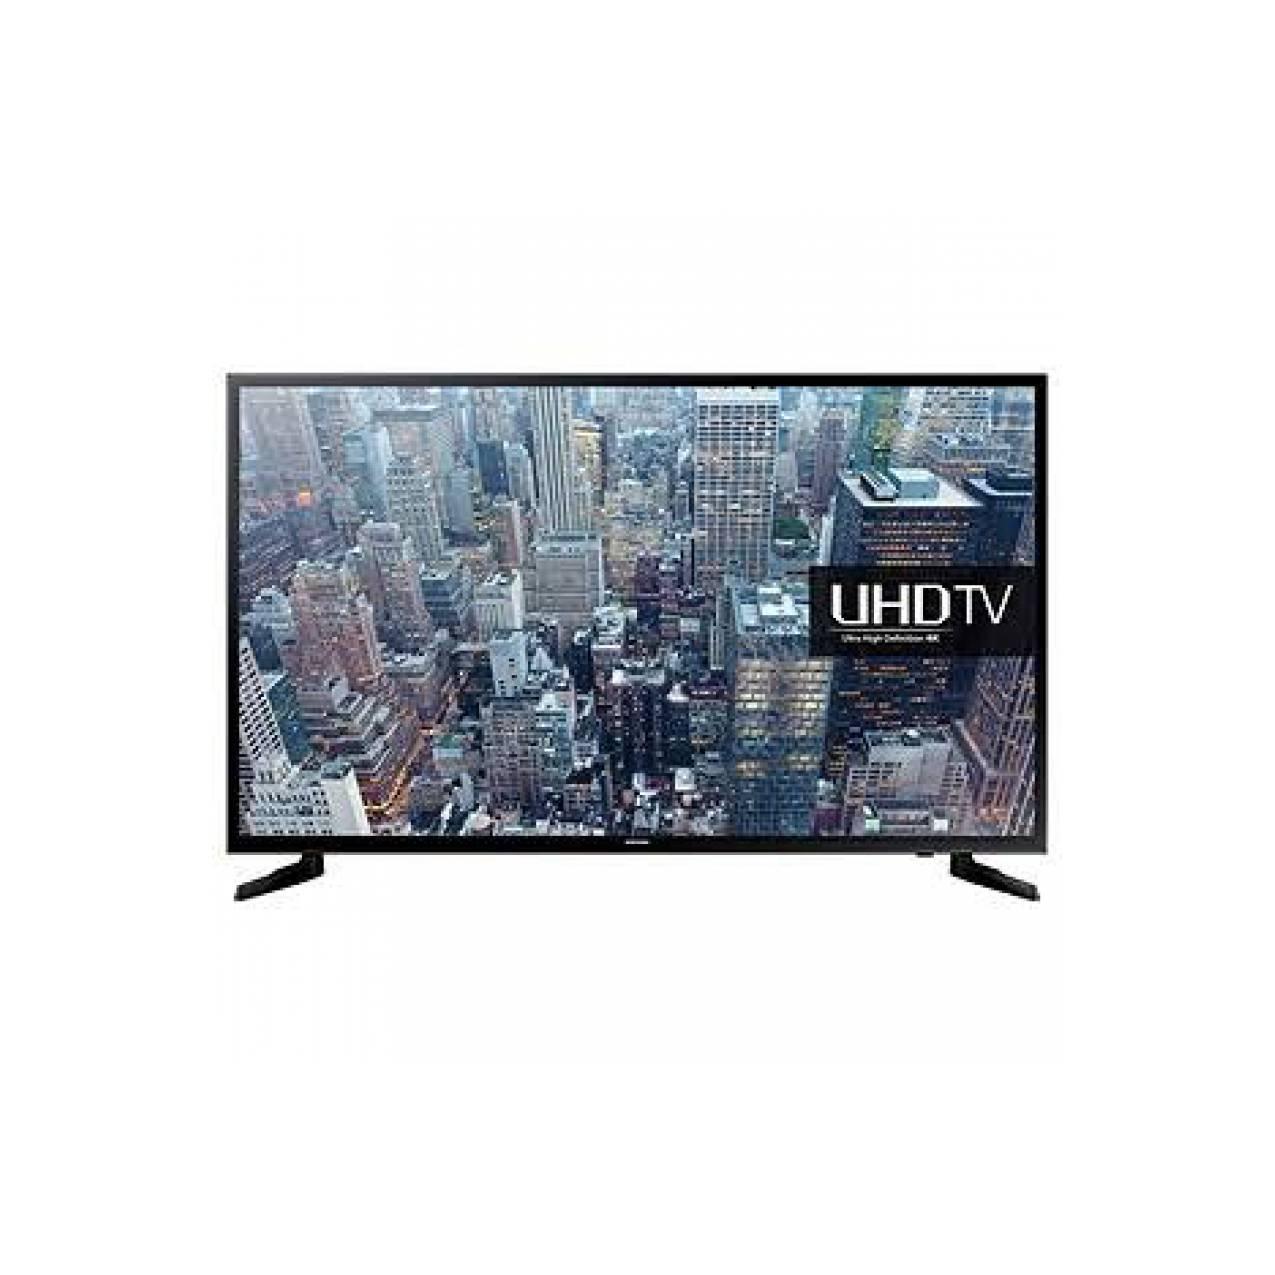 UHD 4K SAMSUNG 40JU6000 40inch Smart Tv